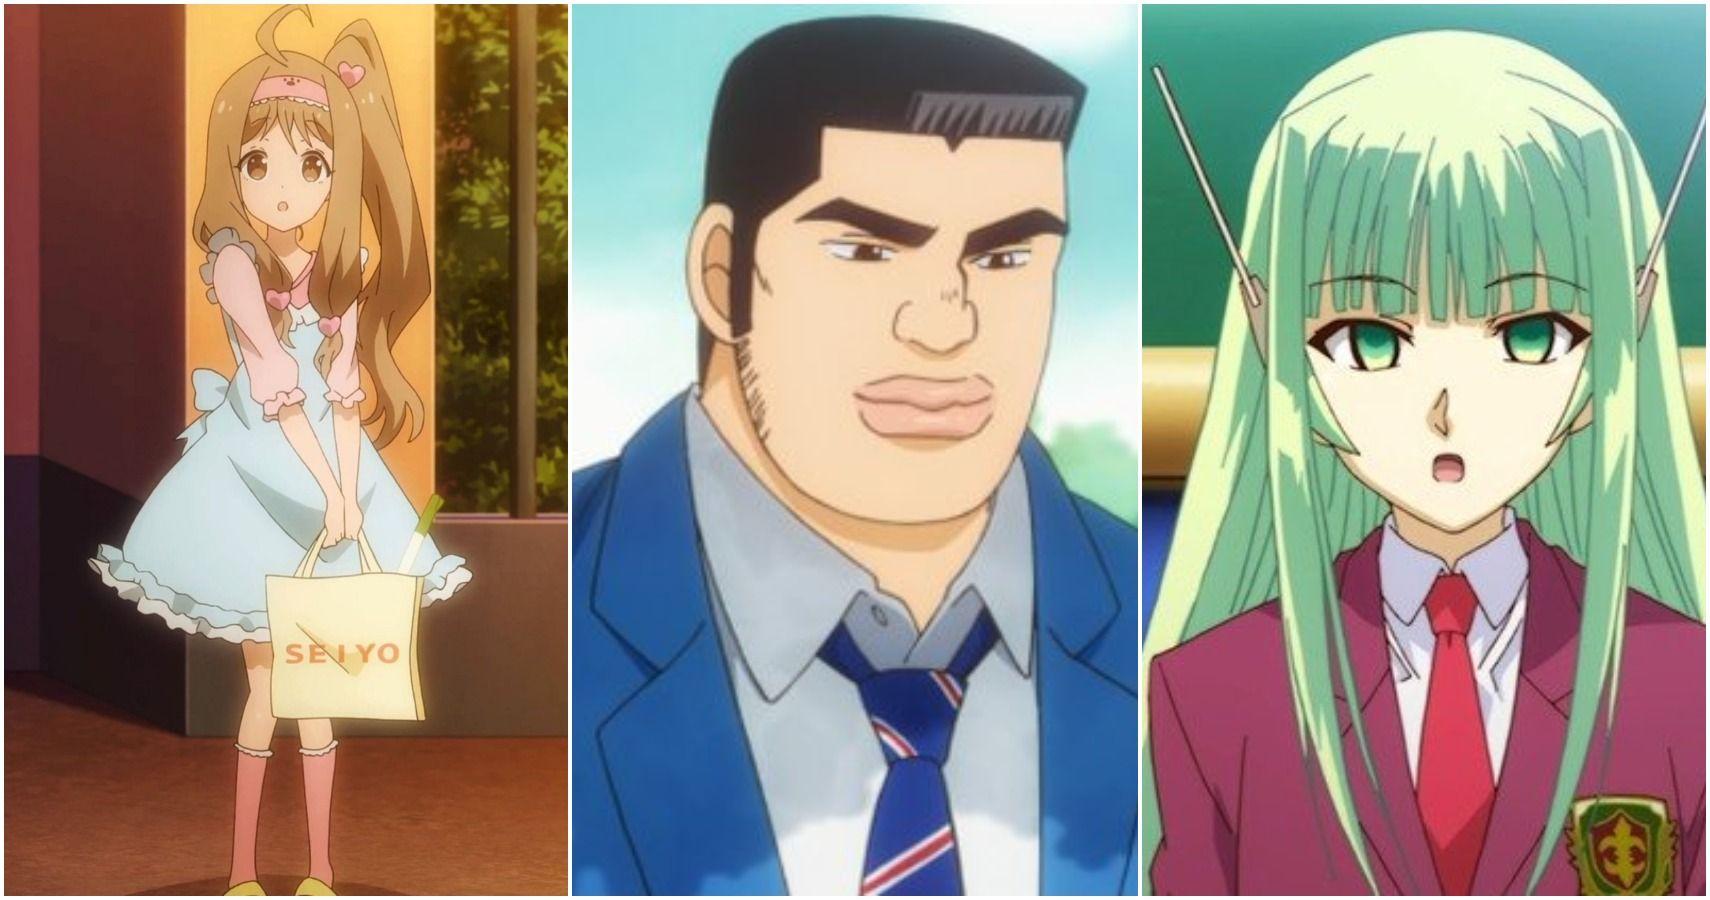 Older than anime girl boy relationship Run out